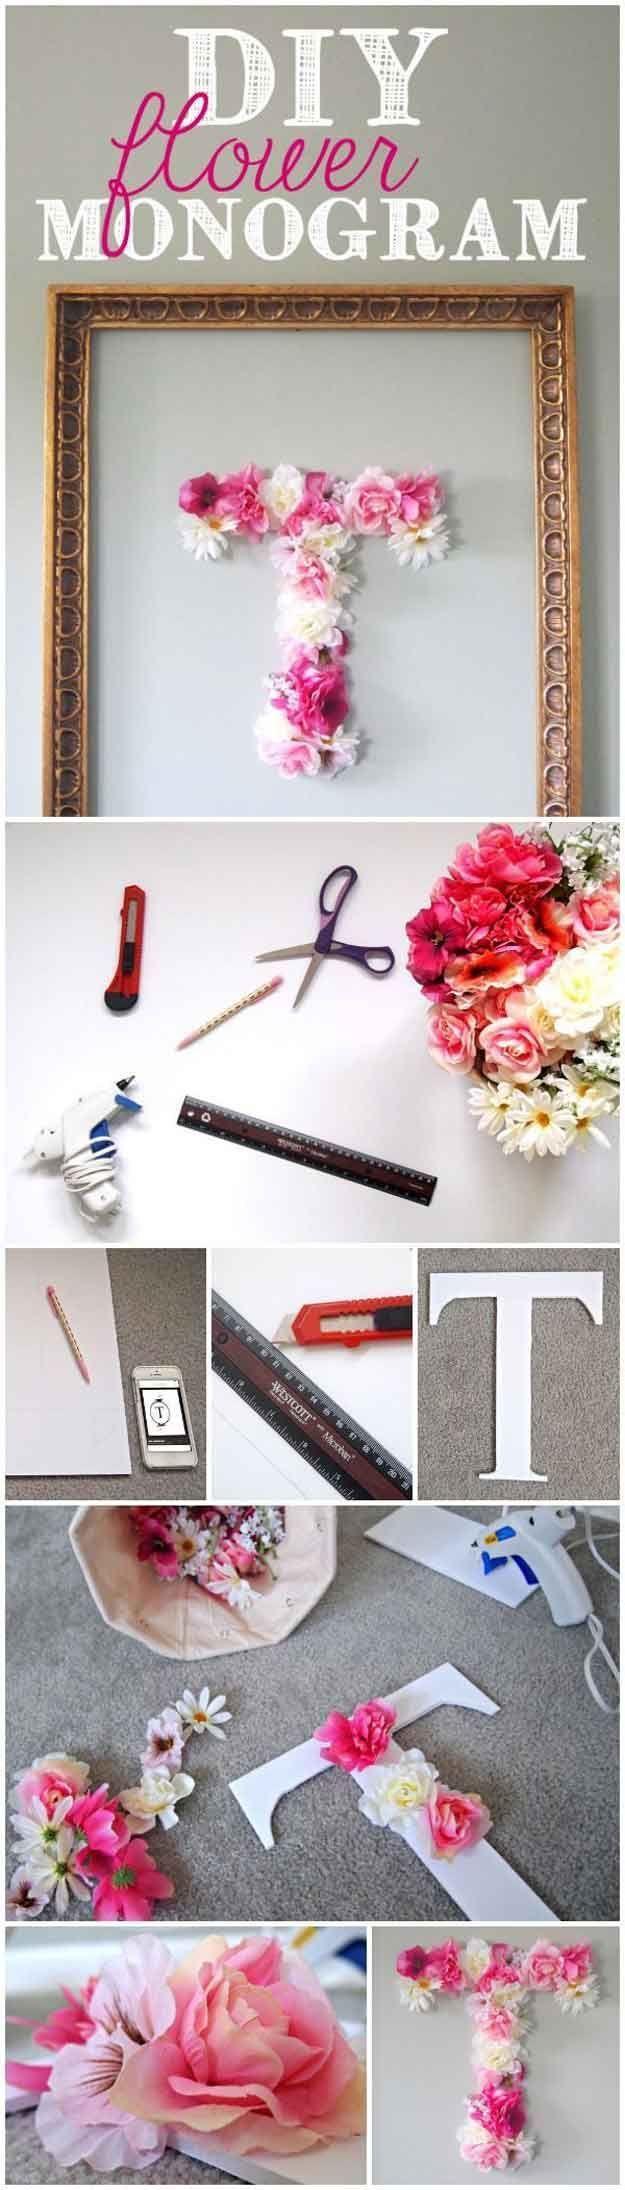 cool wall art room decorations for teen bedroom diy flower monogram by diy ready at - Bedroom Diy Decor